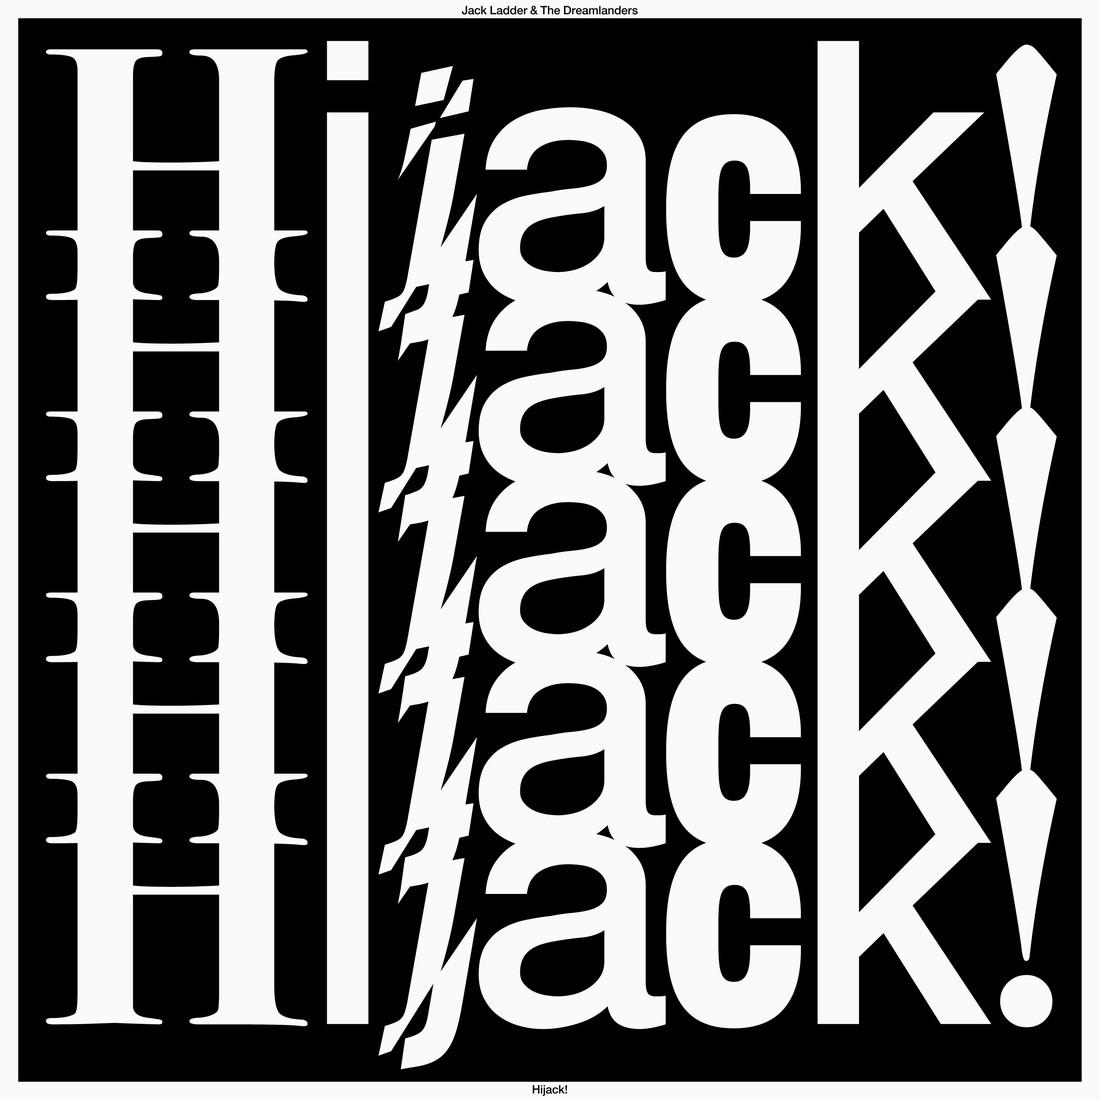 Jack Ladder and the Dreamlanders new album 2021 Hijack